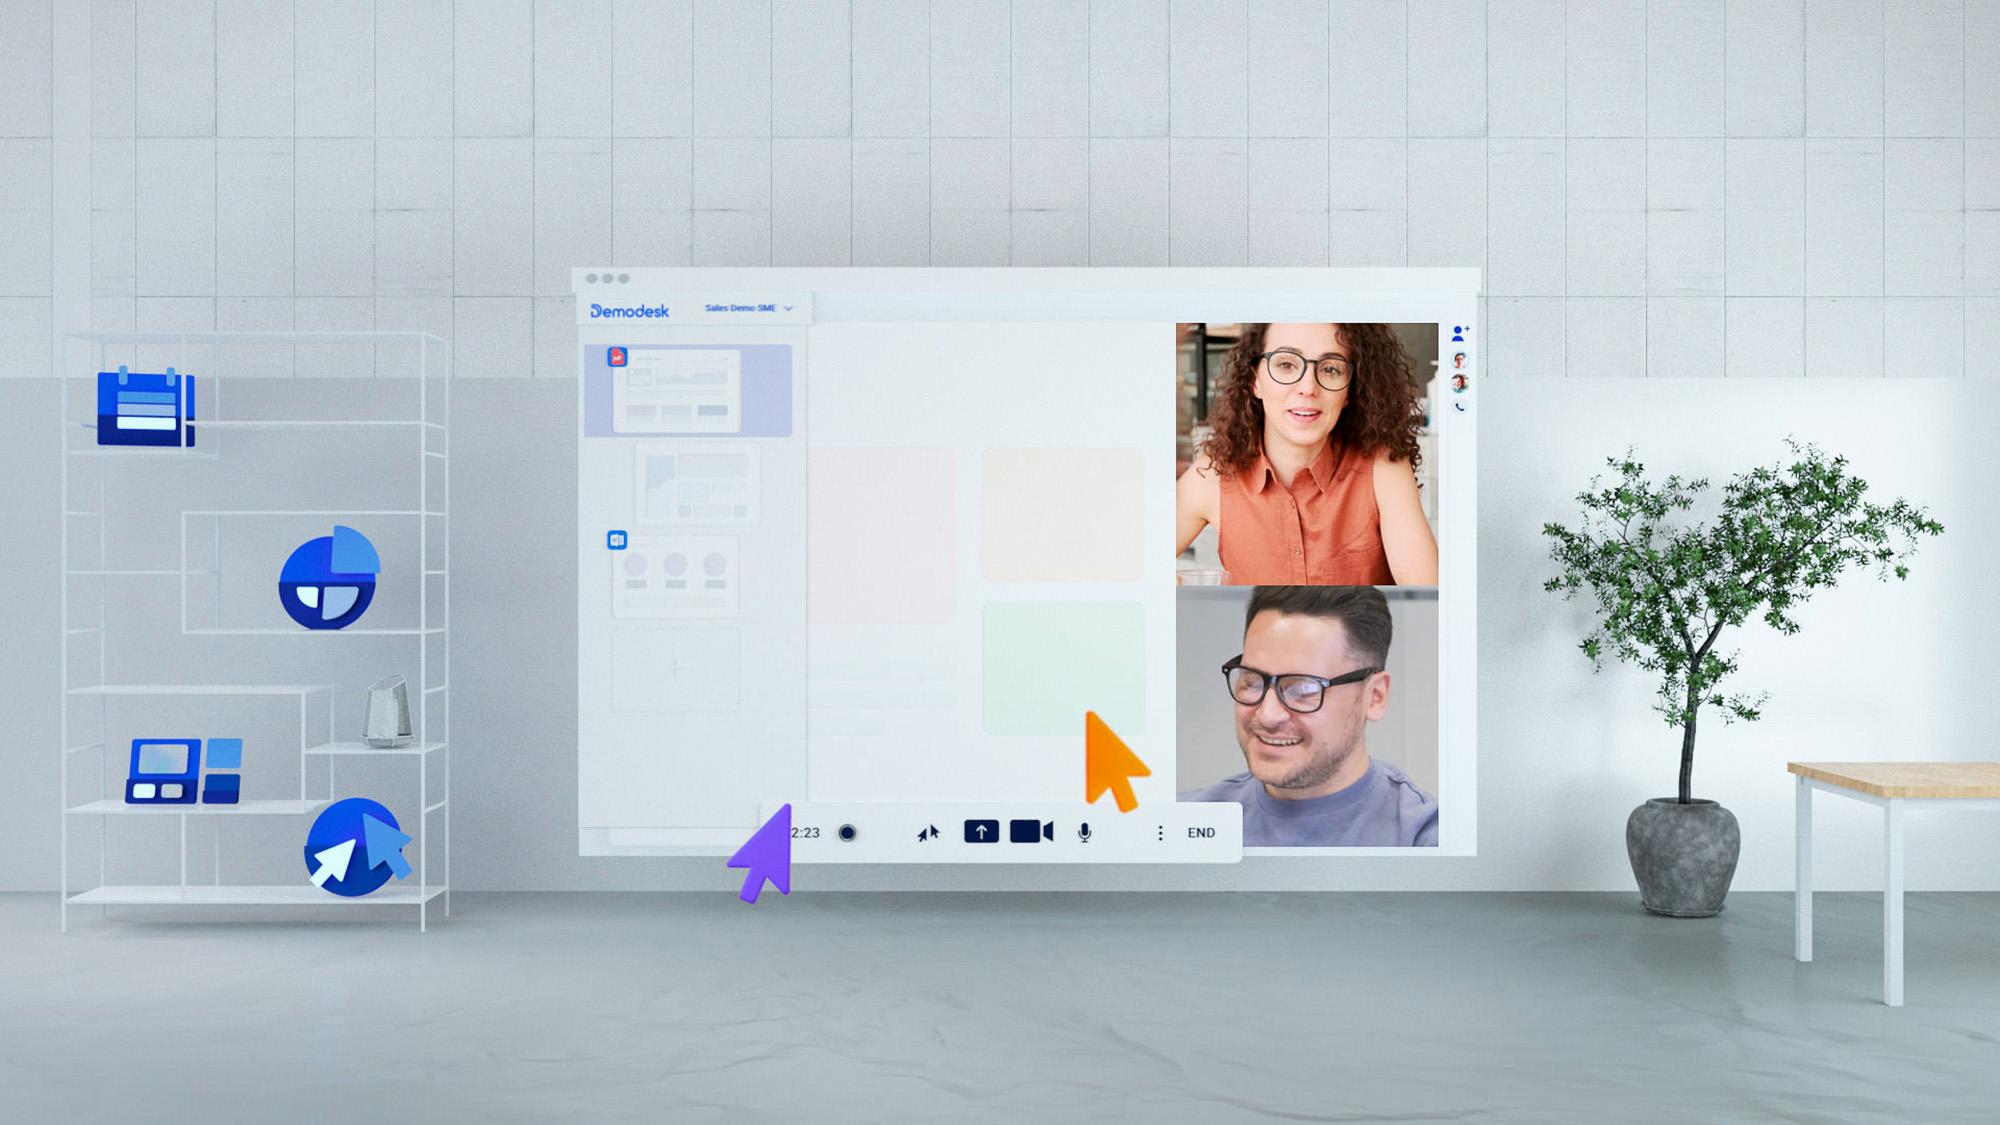 Demodesk-Conversation-Web-Based-Virtual-Display-Konvergenz-Studio